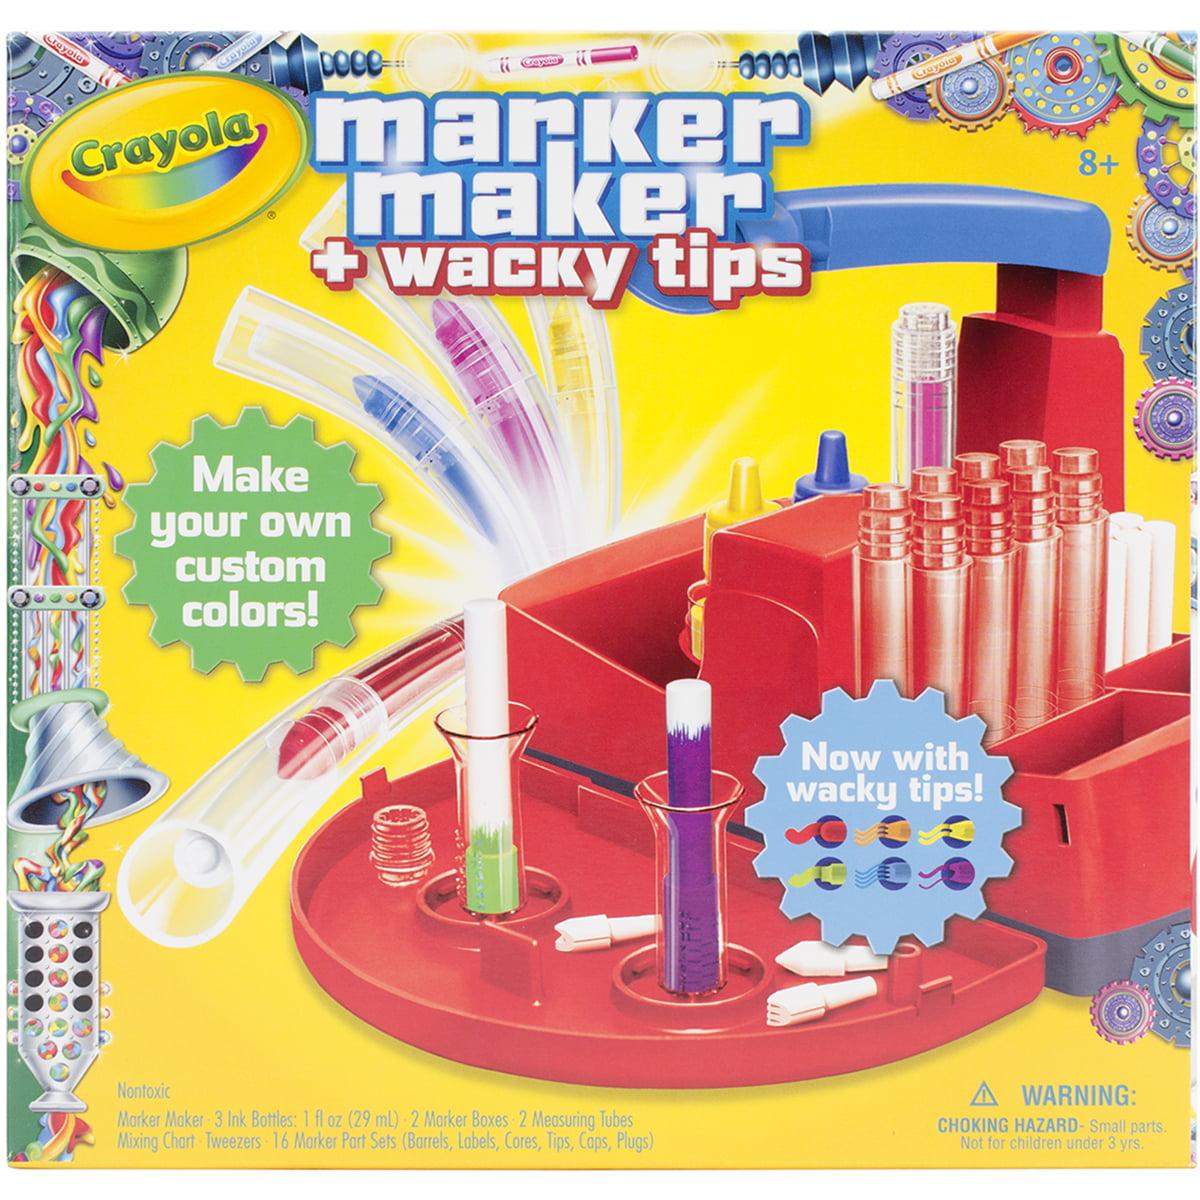 Crayola Marker Maker W Wacky Tips- by Crayola